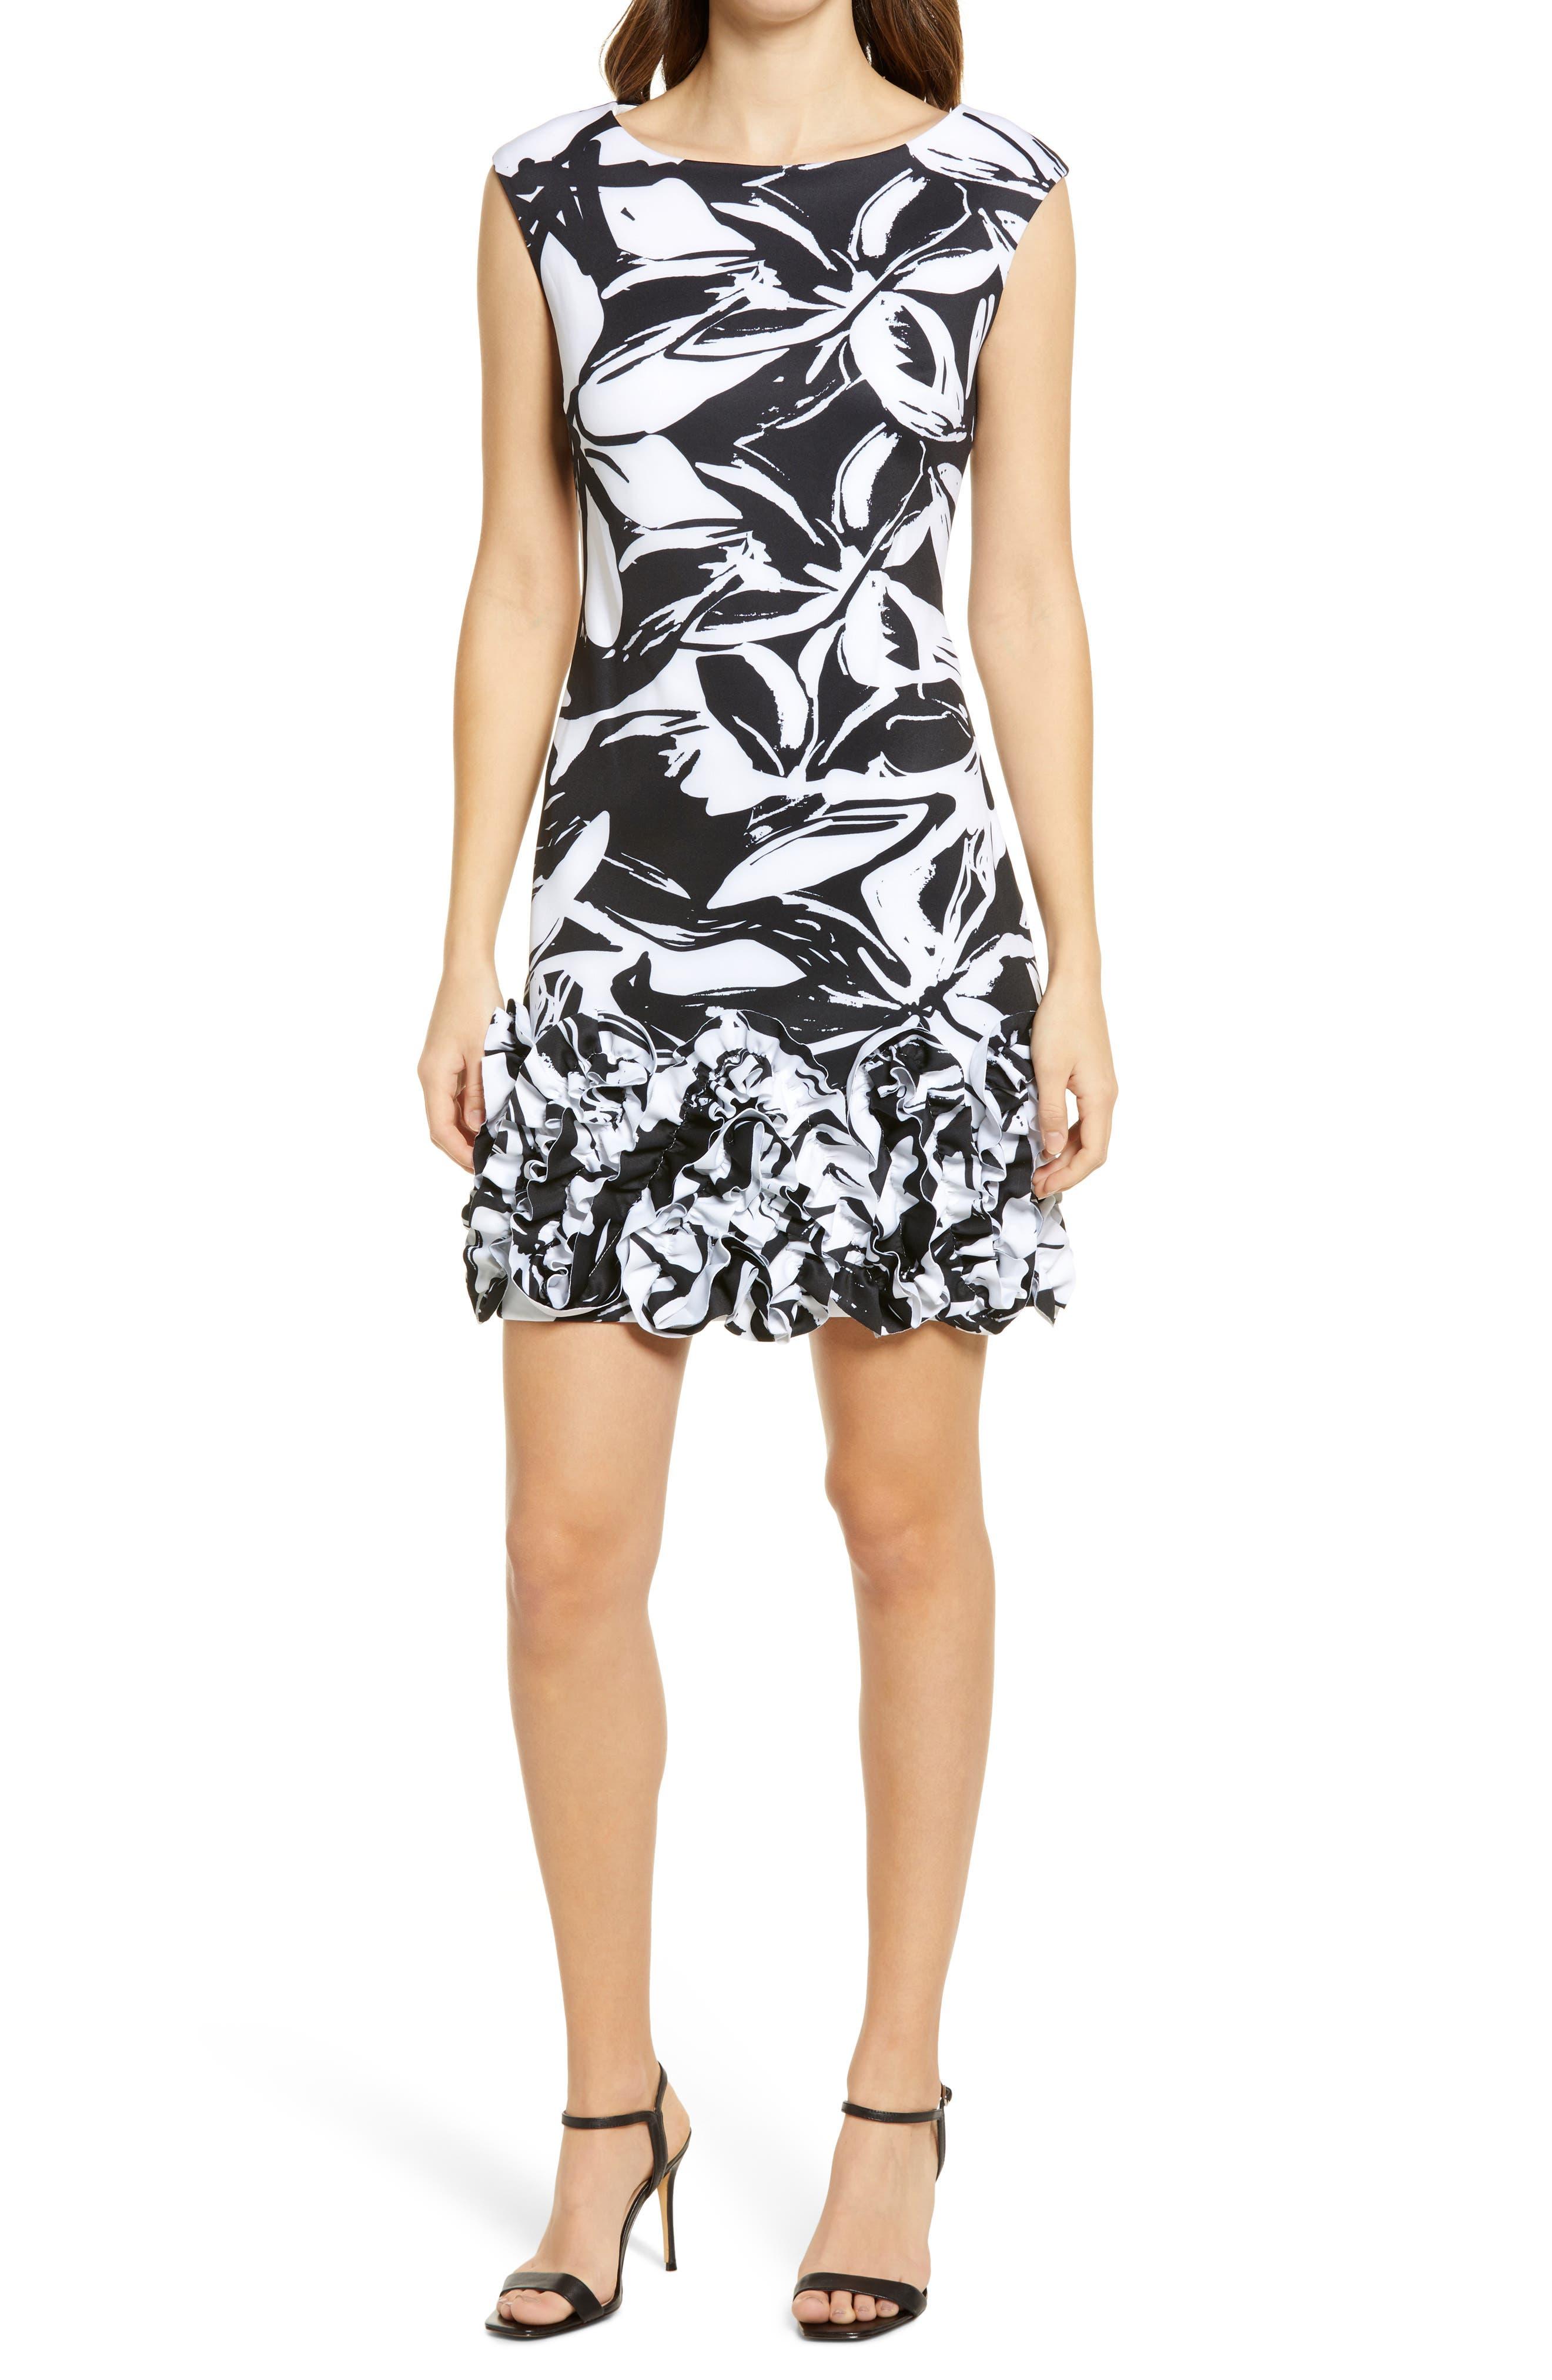 Abstract Floral Ruffle Hem Scuba Knit Sheath Dress